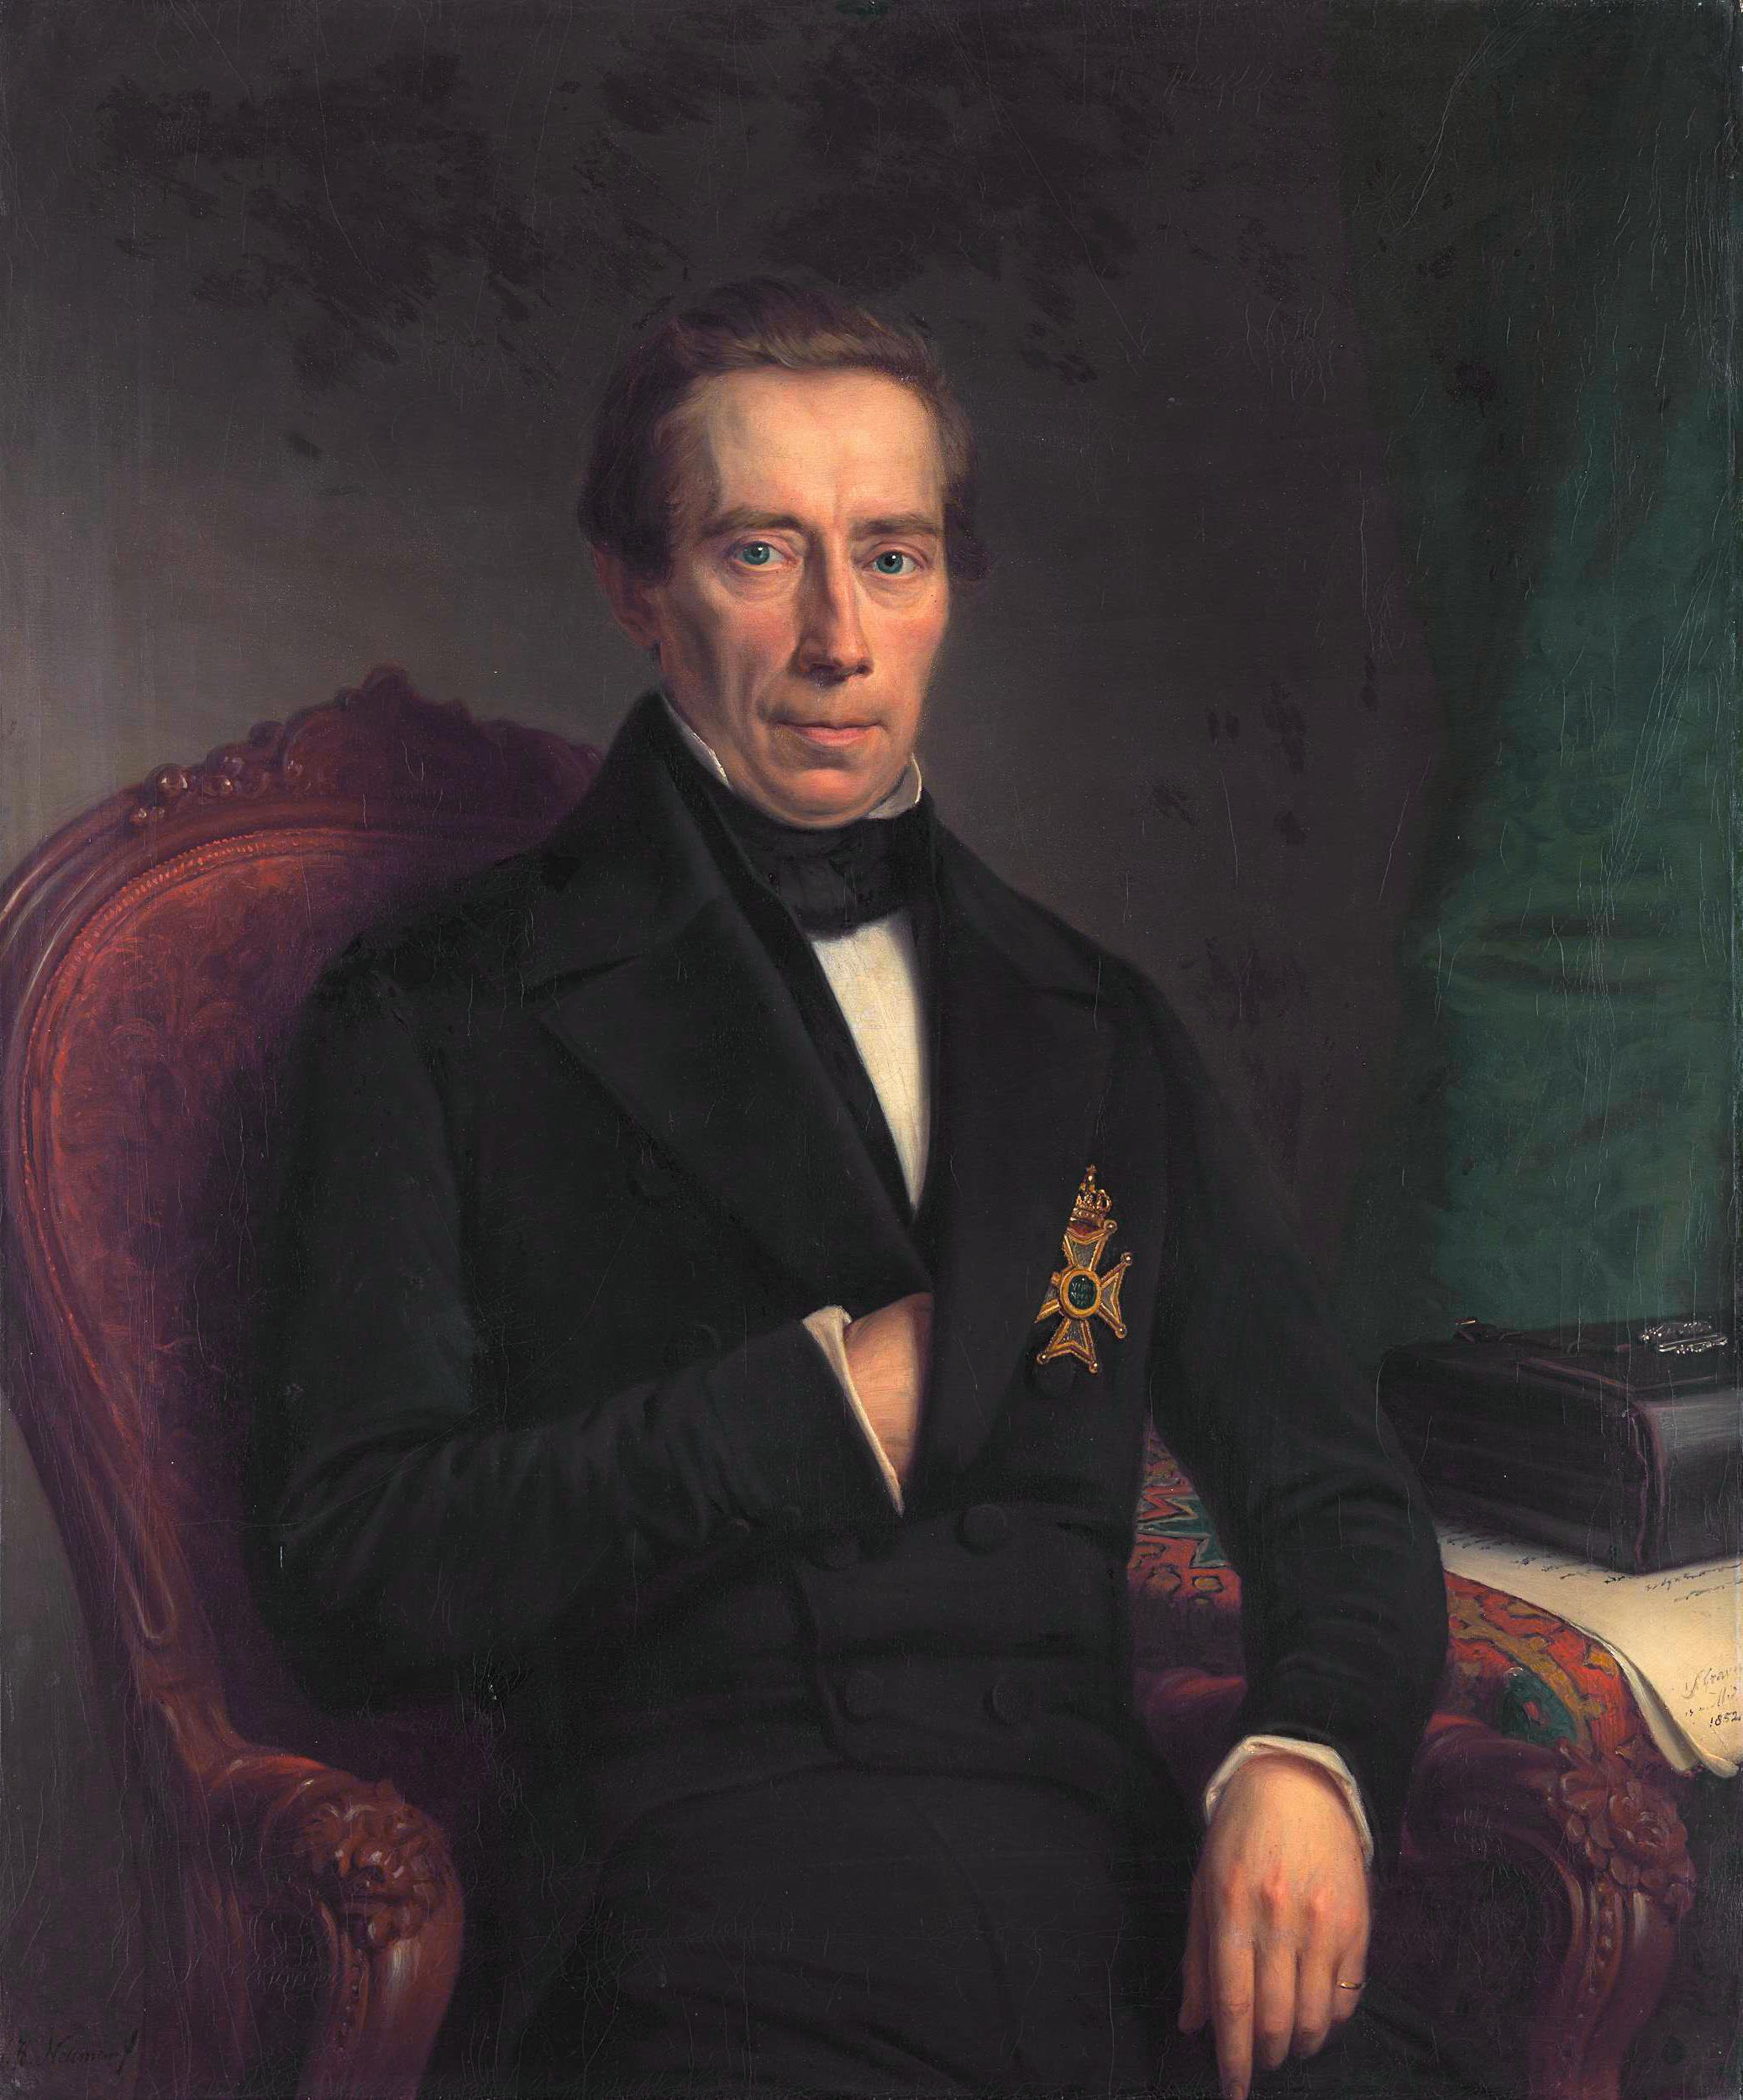 https://upload.wikimedia.org/wikipedia/commons/7/7a/Johan_Heinrich_Neuman_-_Johan_Rudolf_Thorbecke.jpg